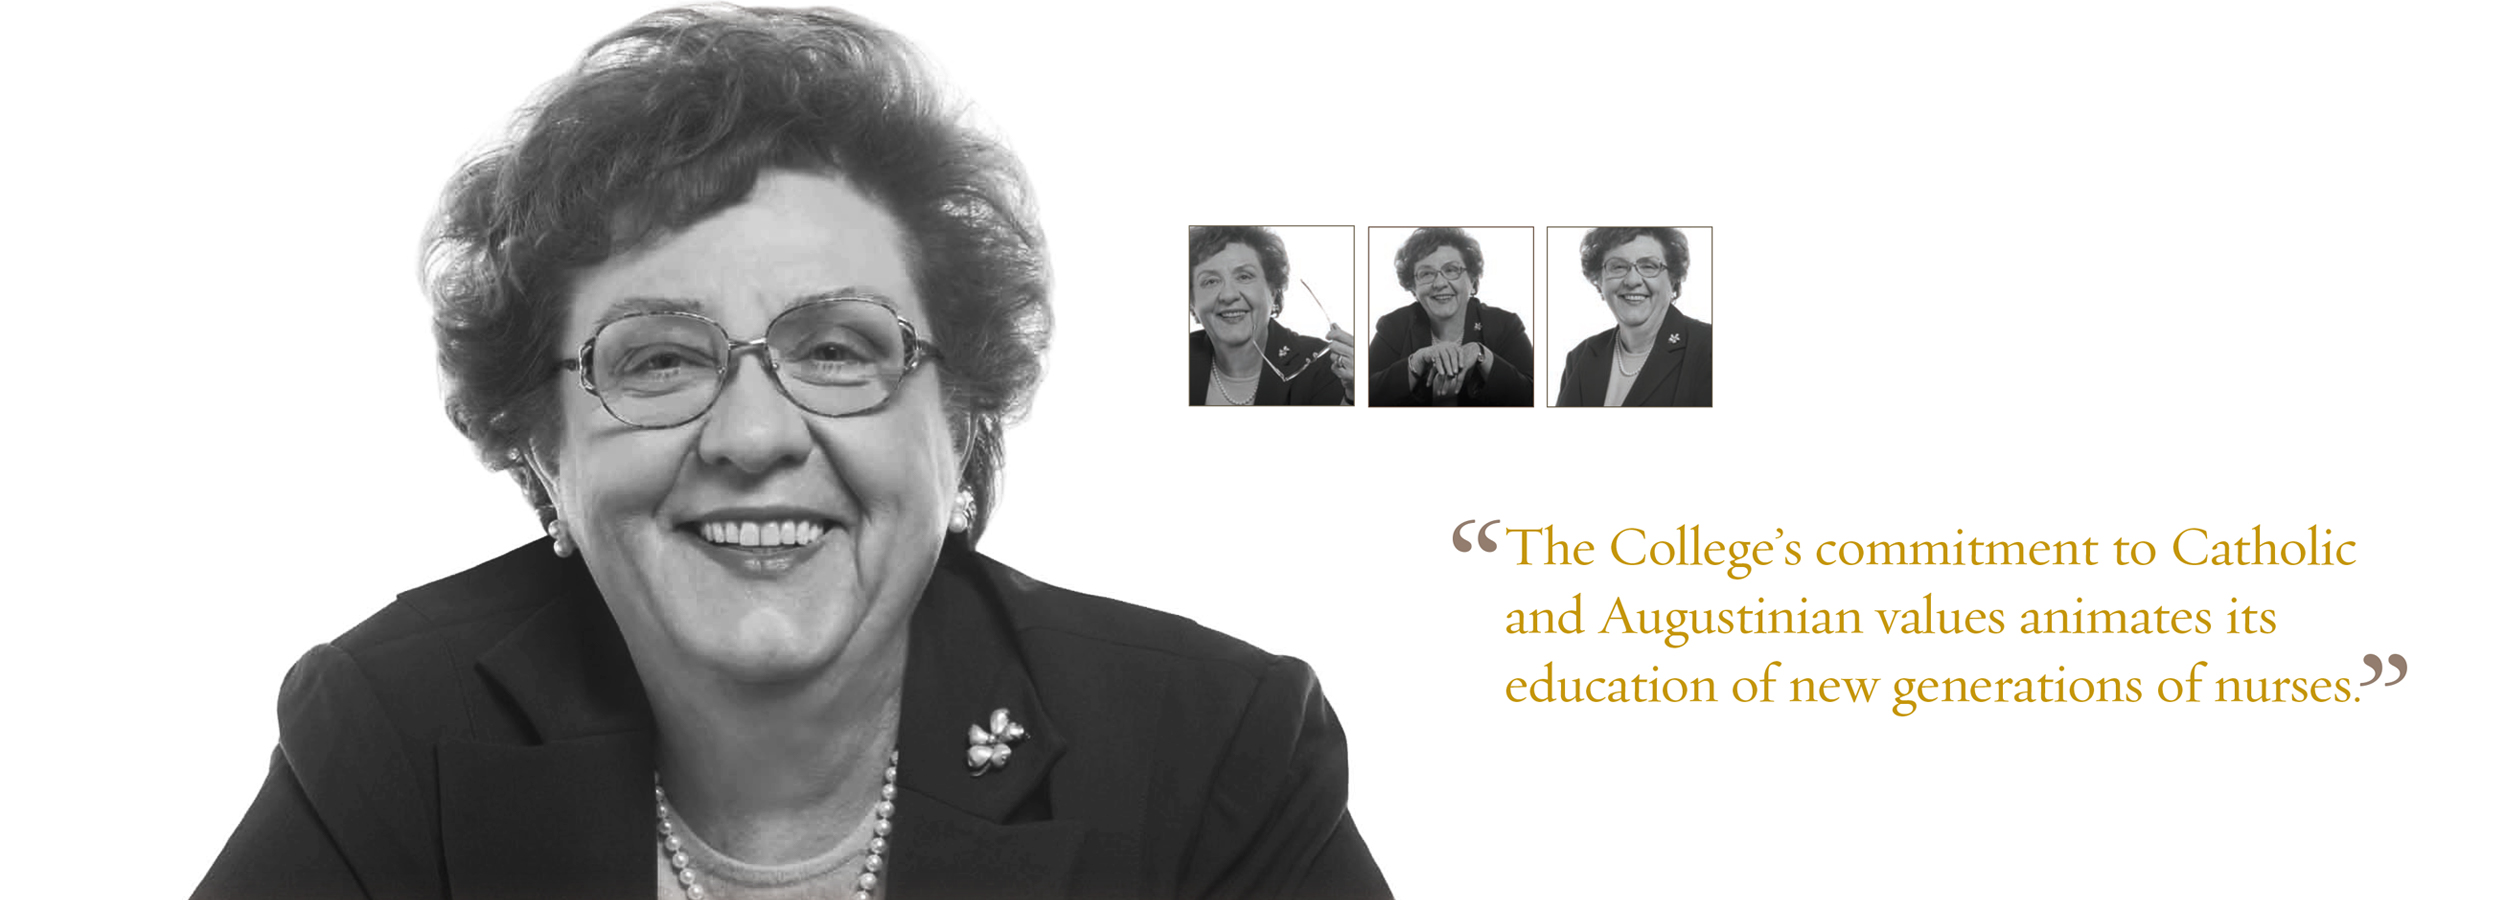 Villanova University President's Report 2008–09